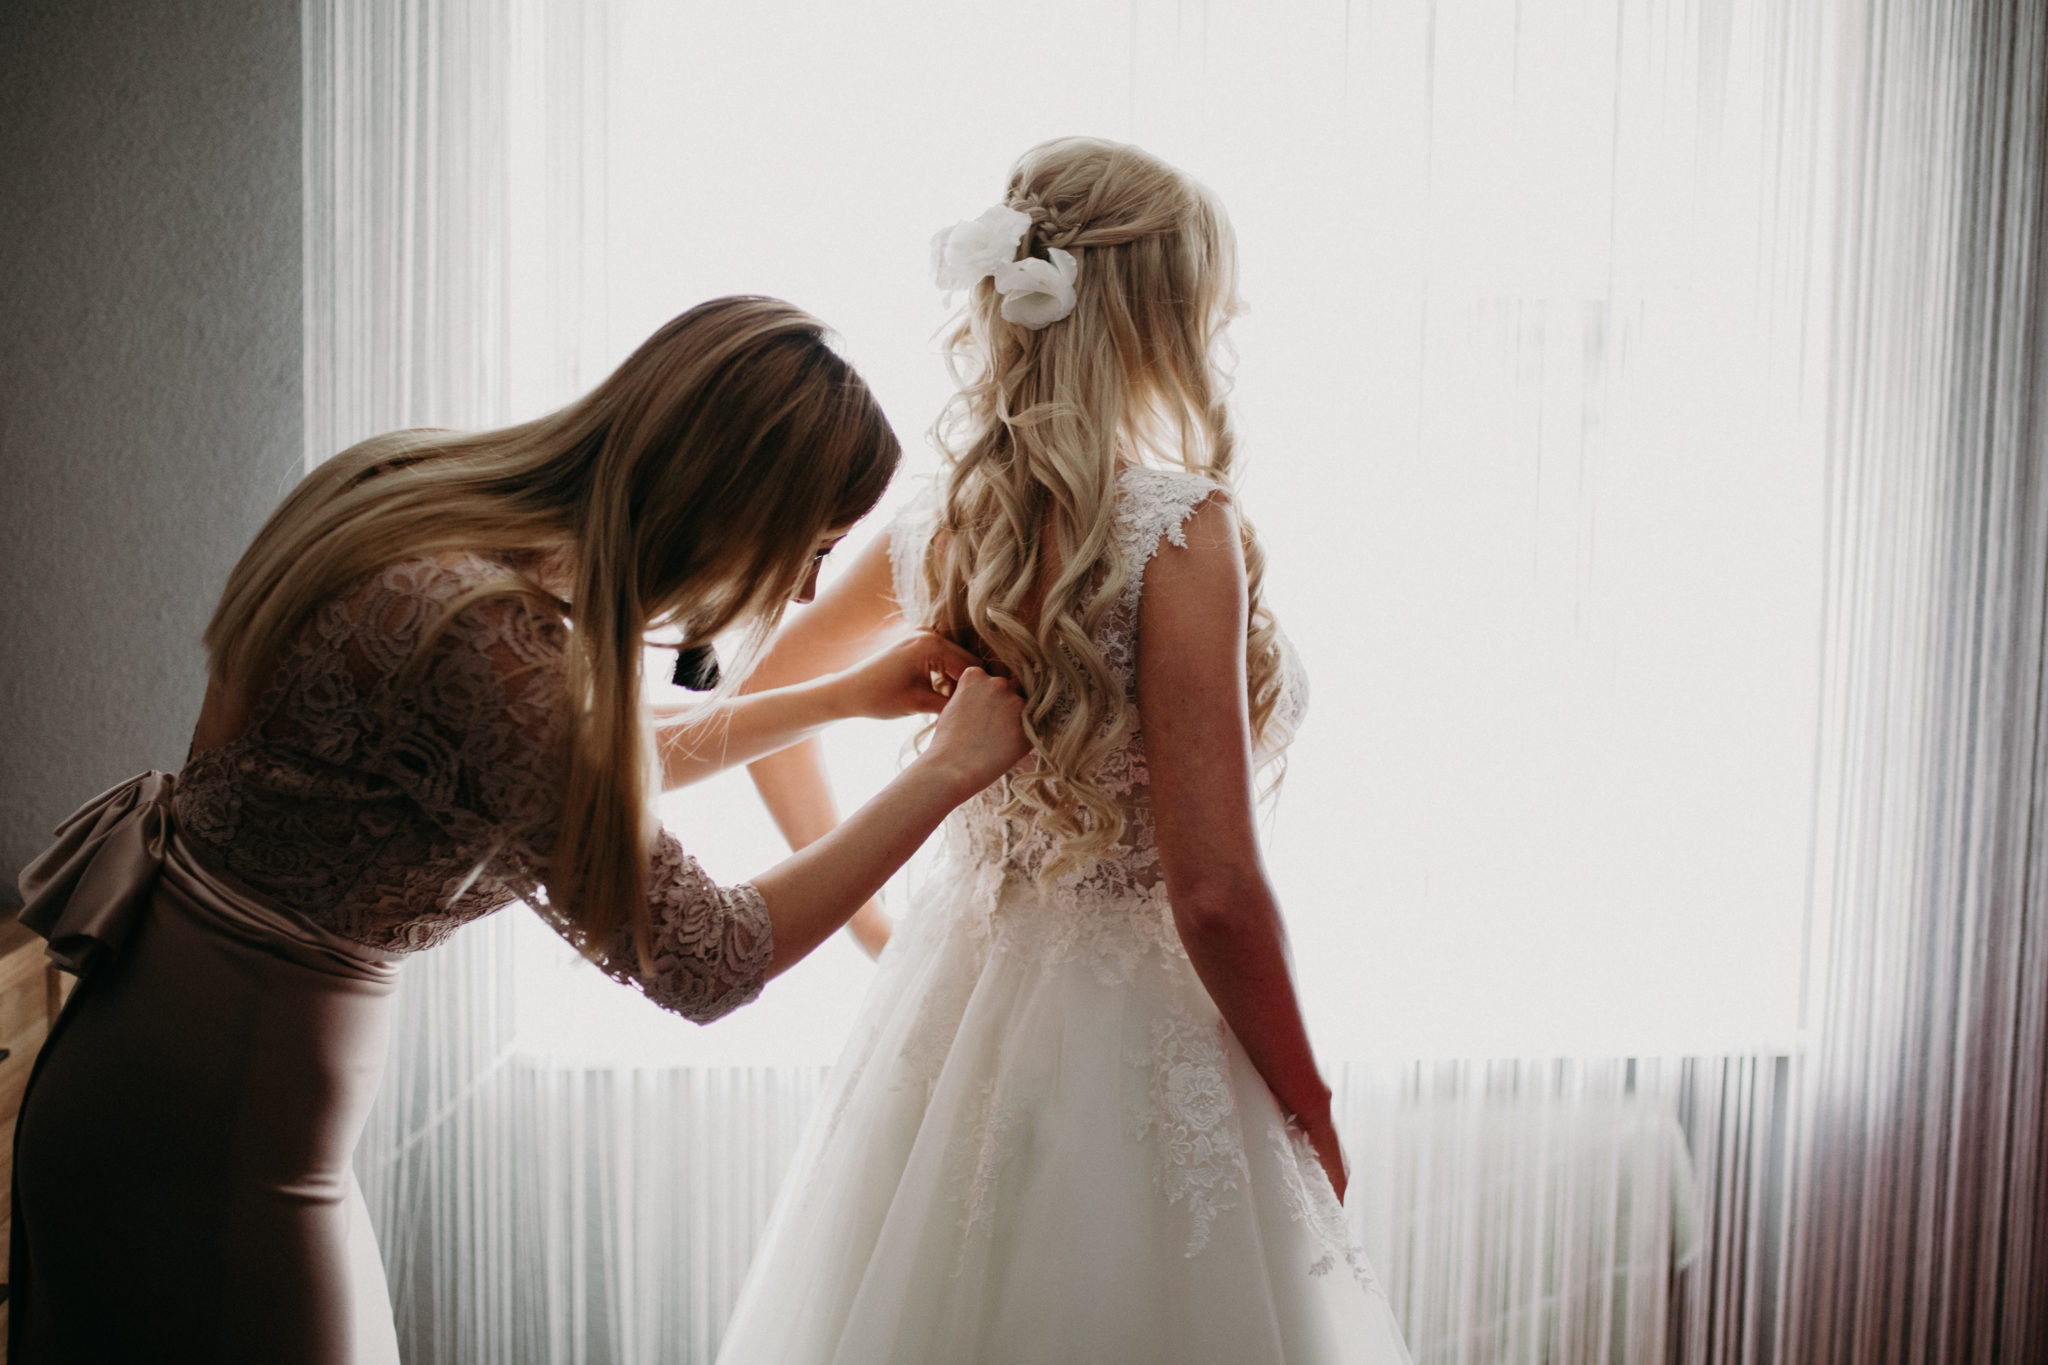 asia i mateusz13 1 - fotografiaam Fotografia ślubna RK wedding